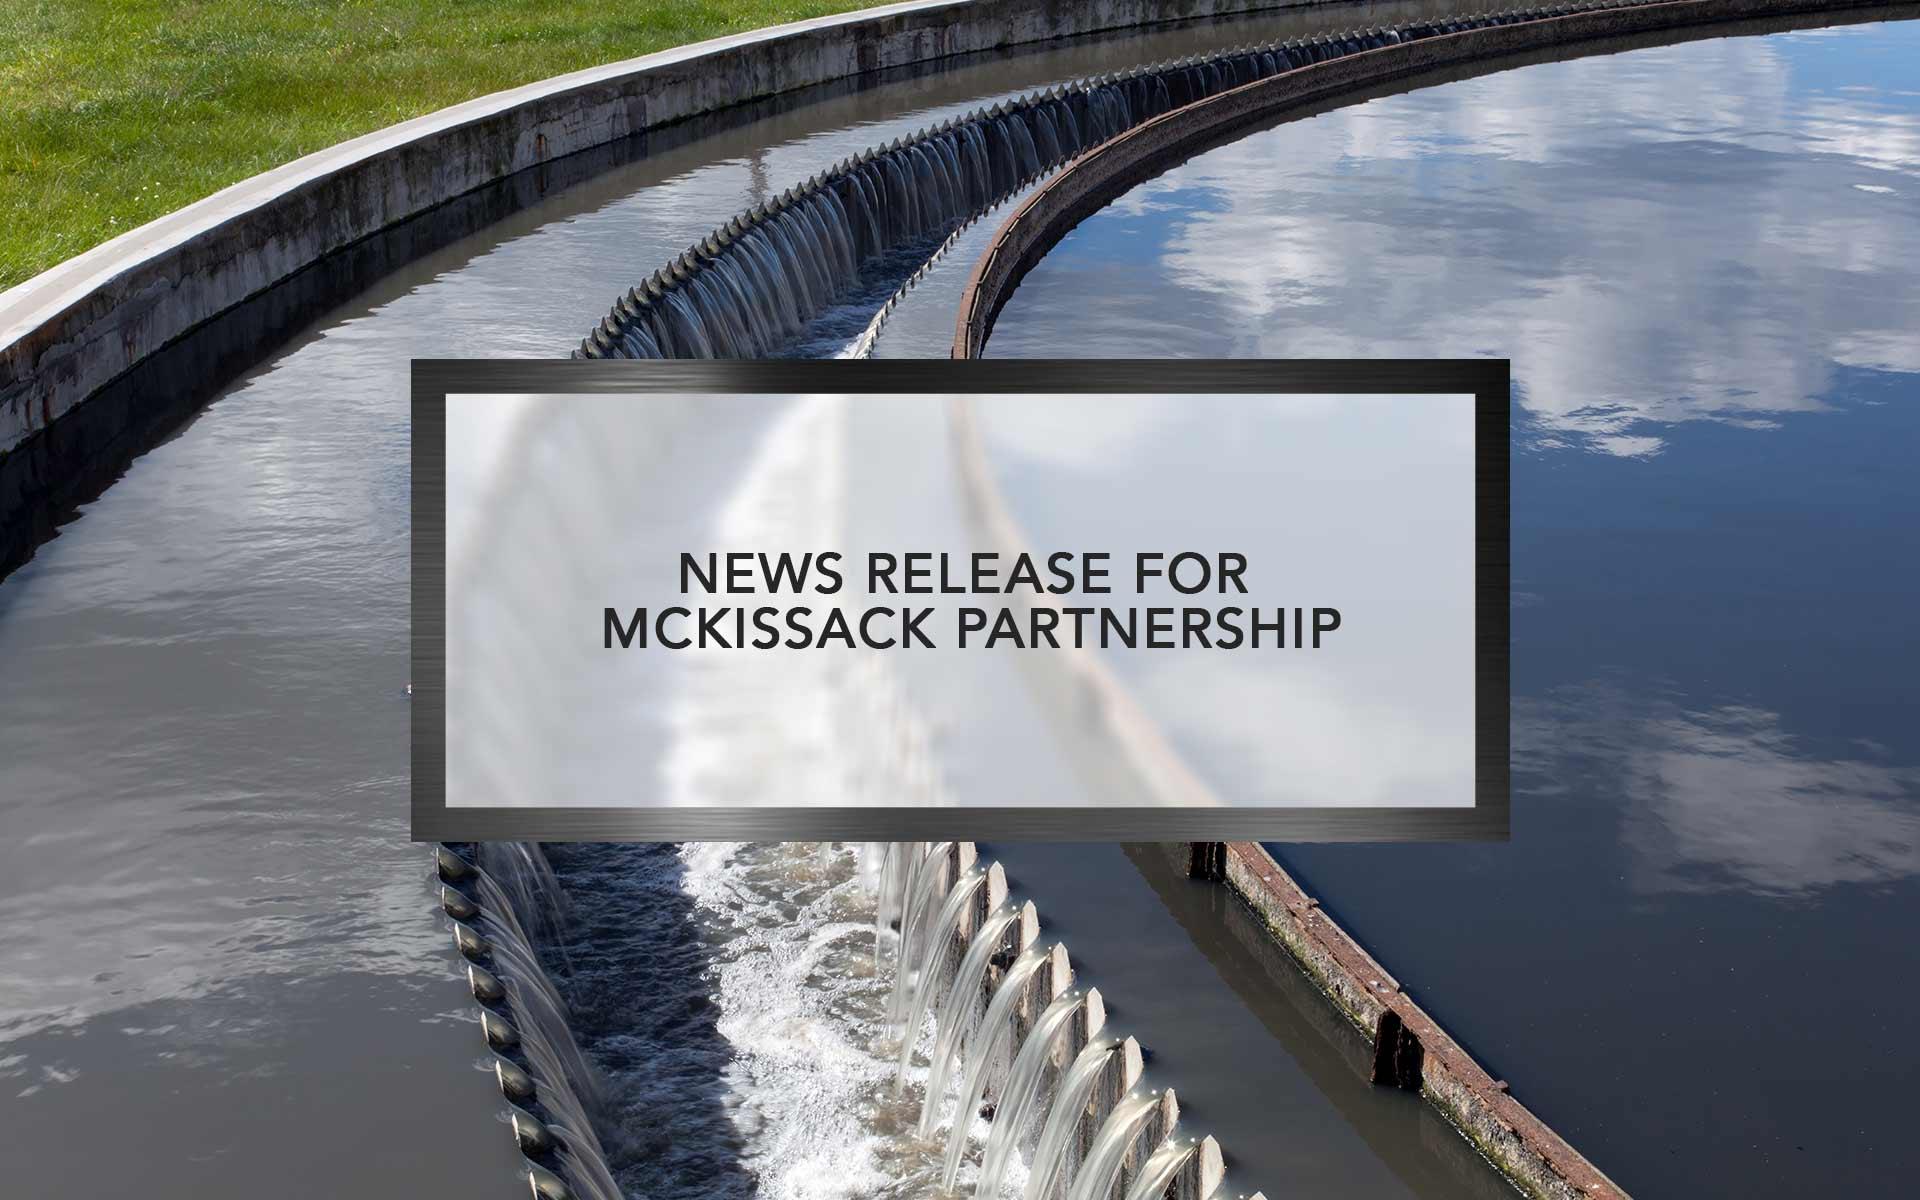 News Release for McKissack Partnership